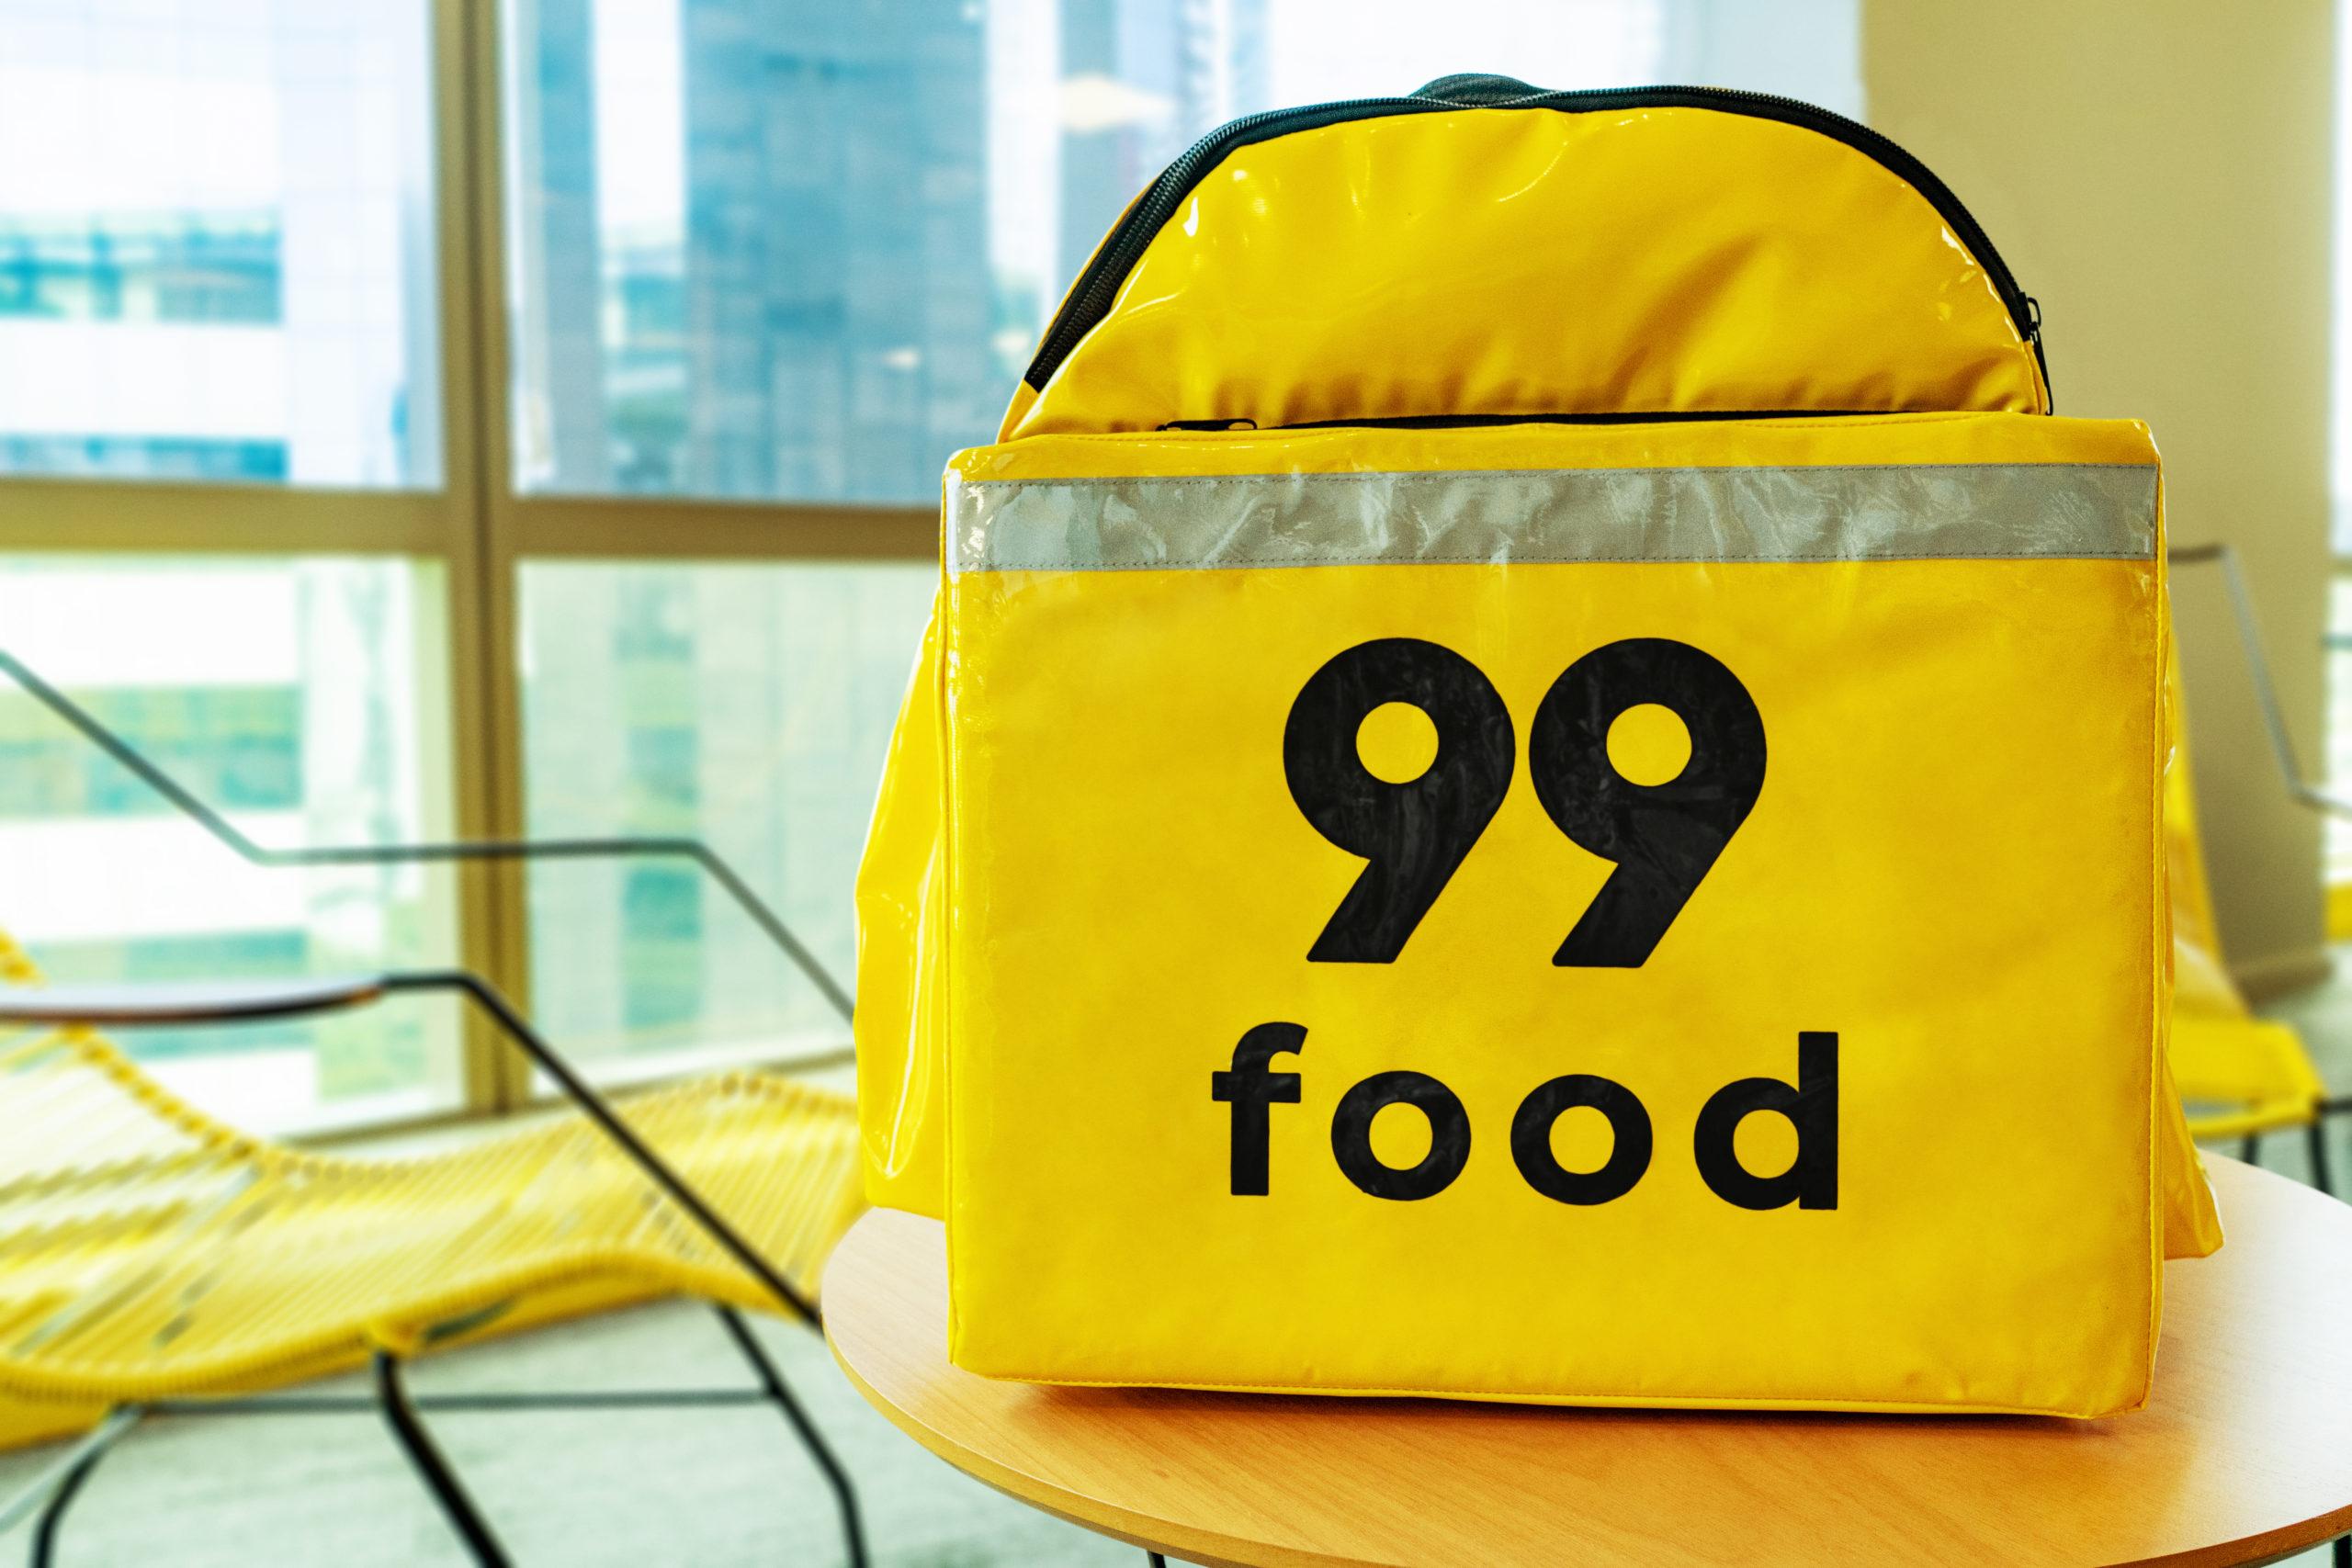 vender pelo 99 food